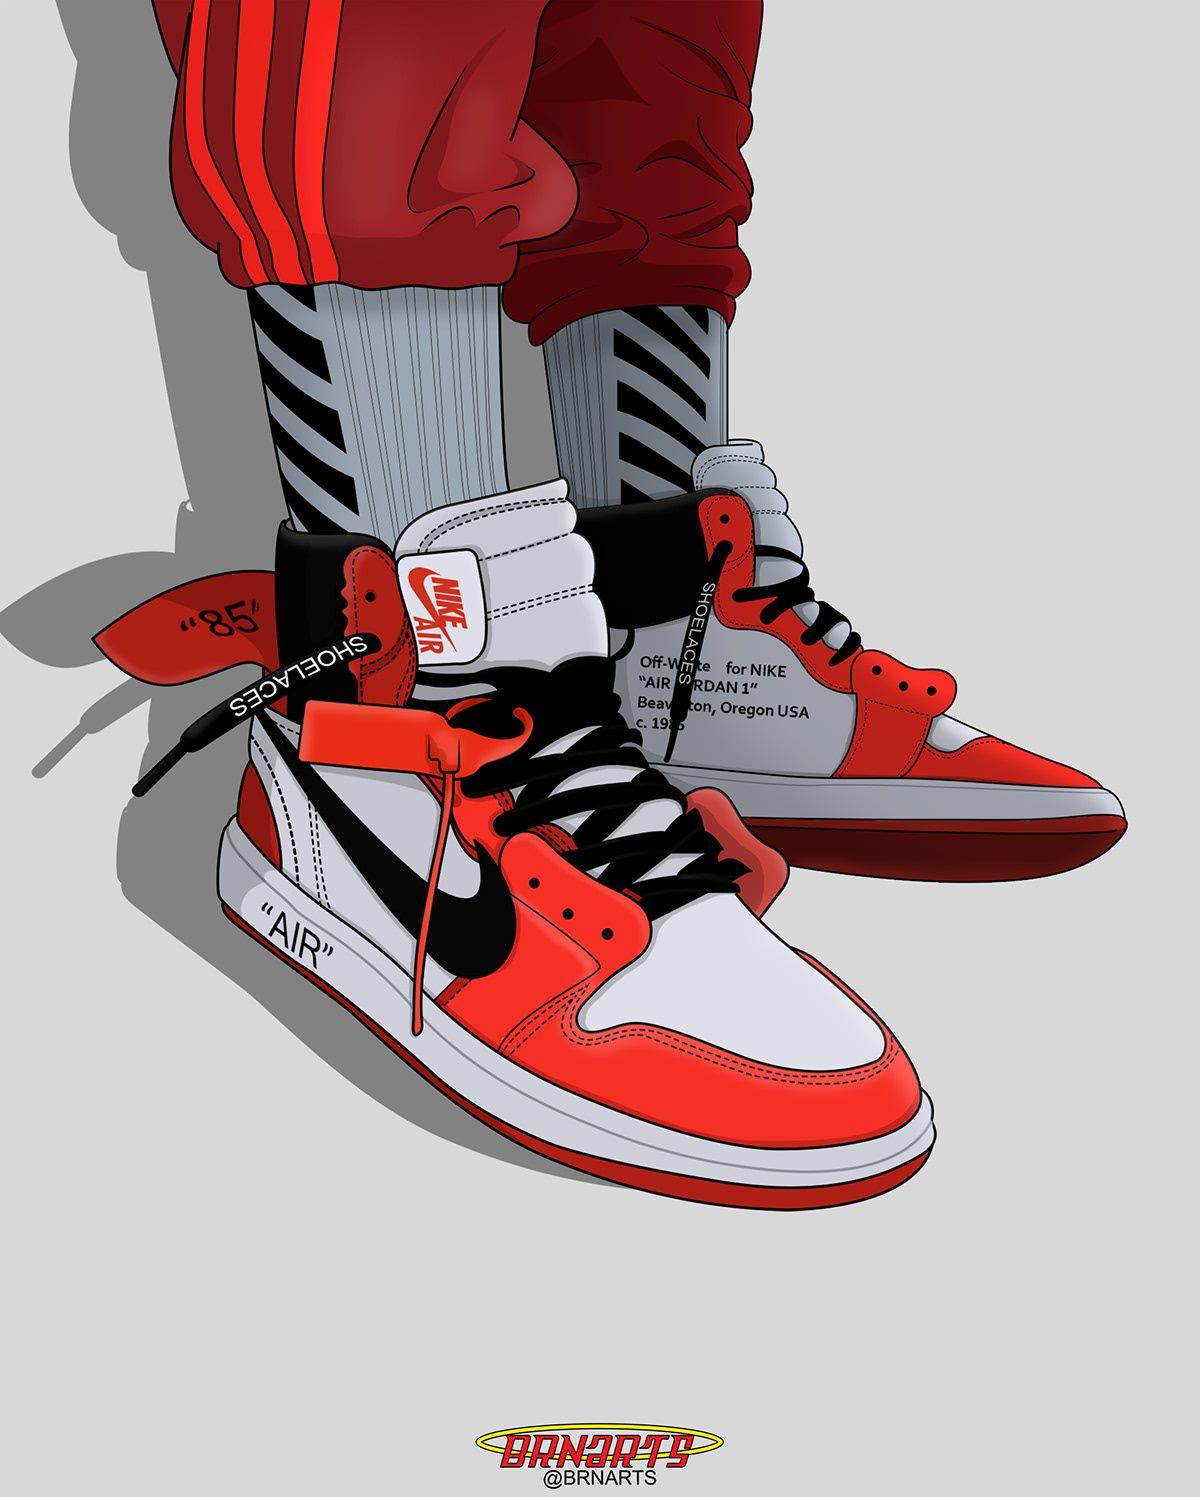 Ver Perfil Completo Comentarios Debes Registrarte Para Unirte A La Conversacion Shoes Wallpaper Sneakers Wallpaper Streetwear Wallpaper